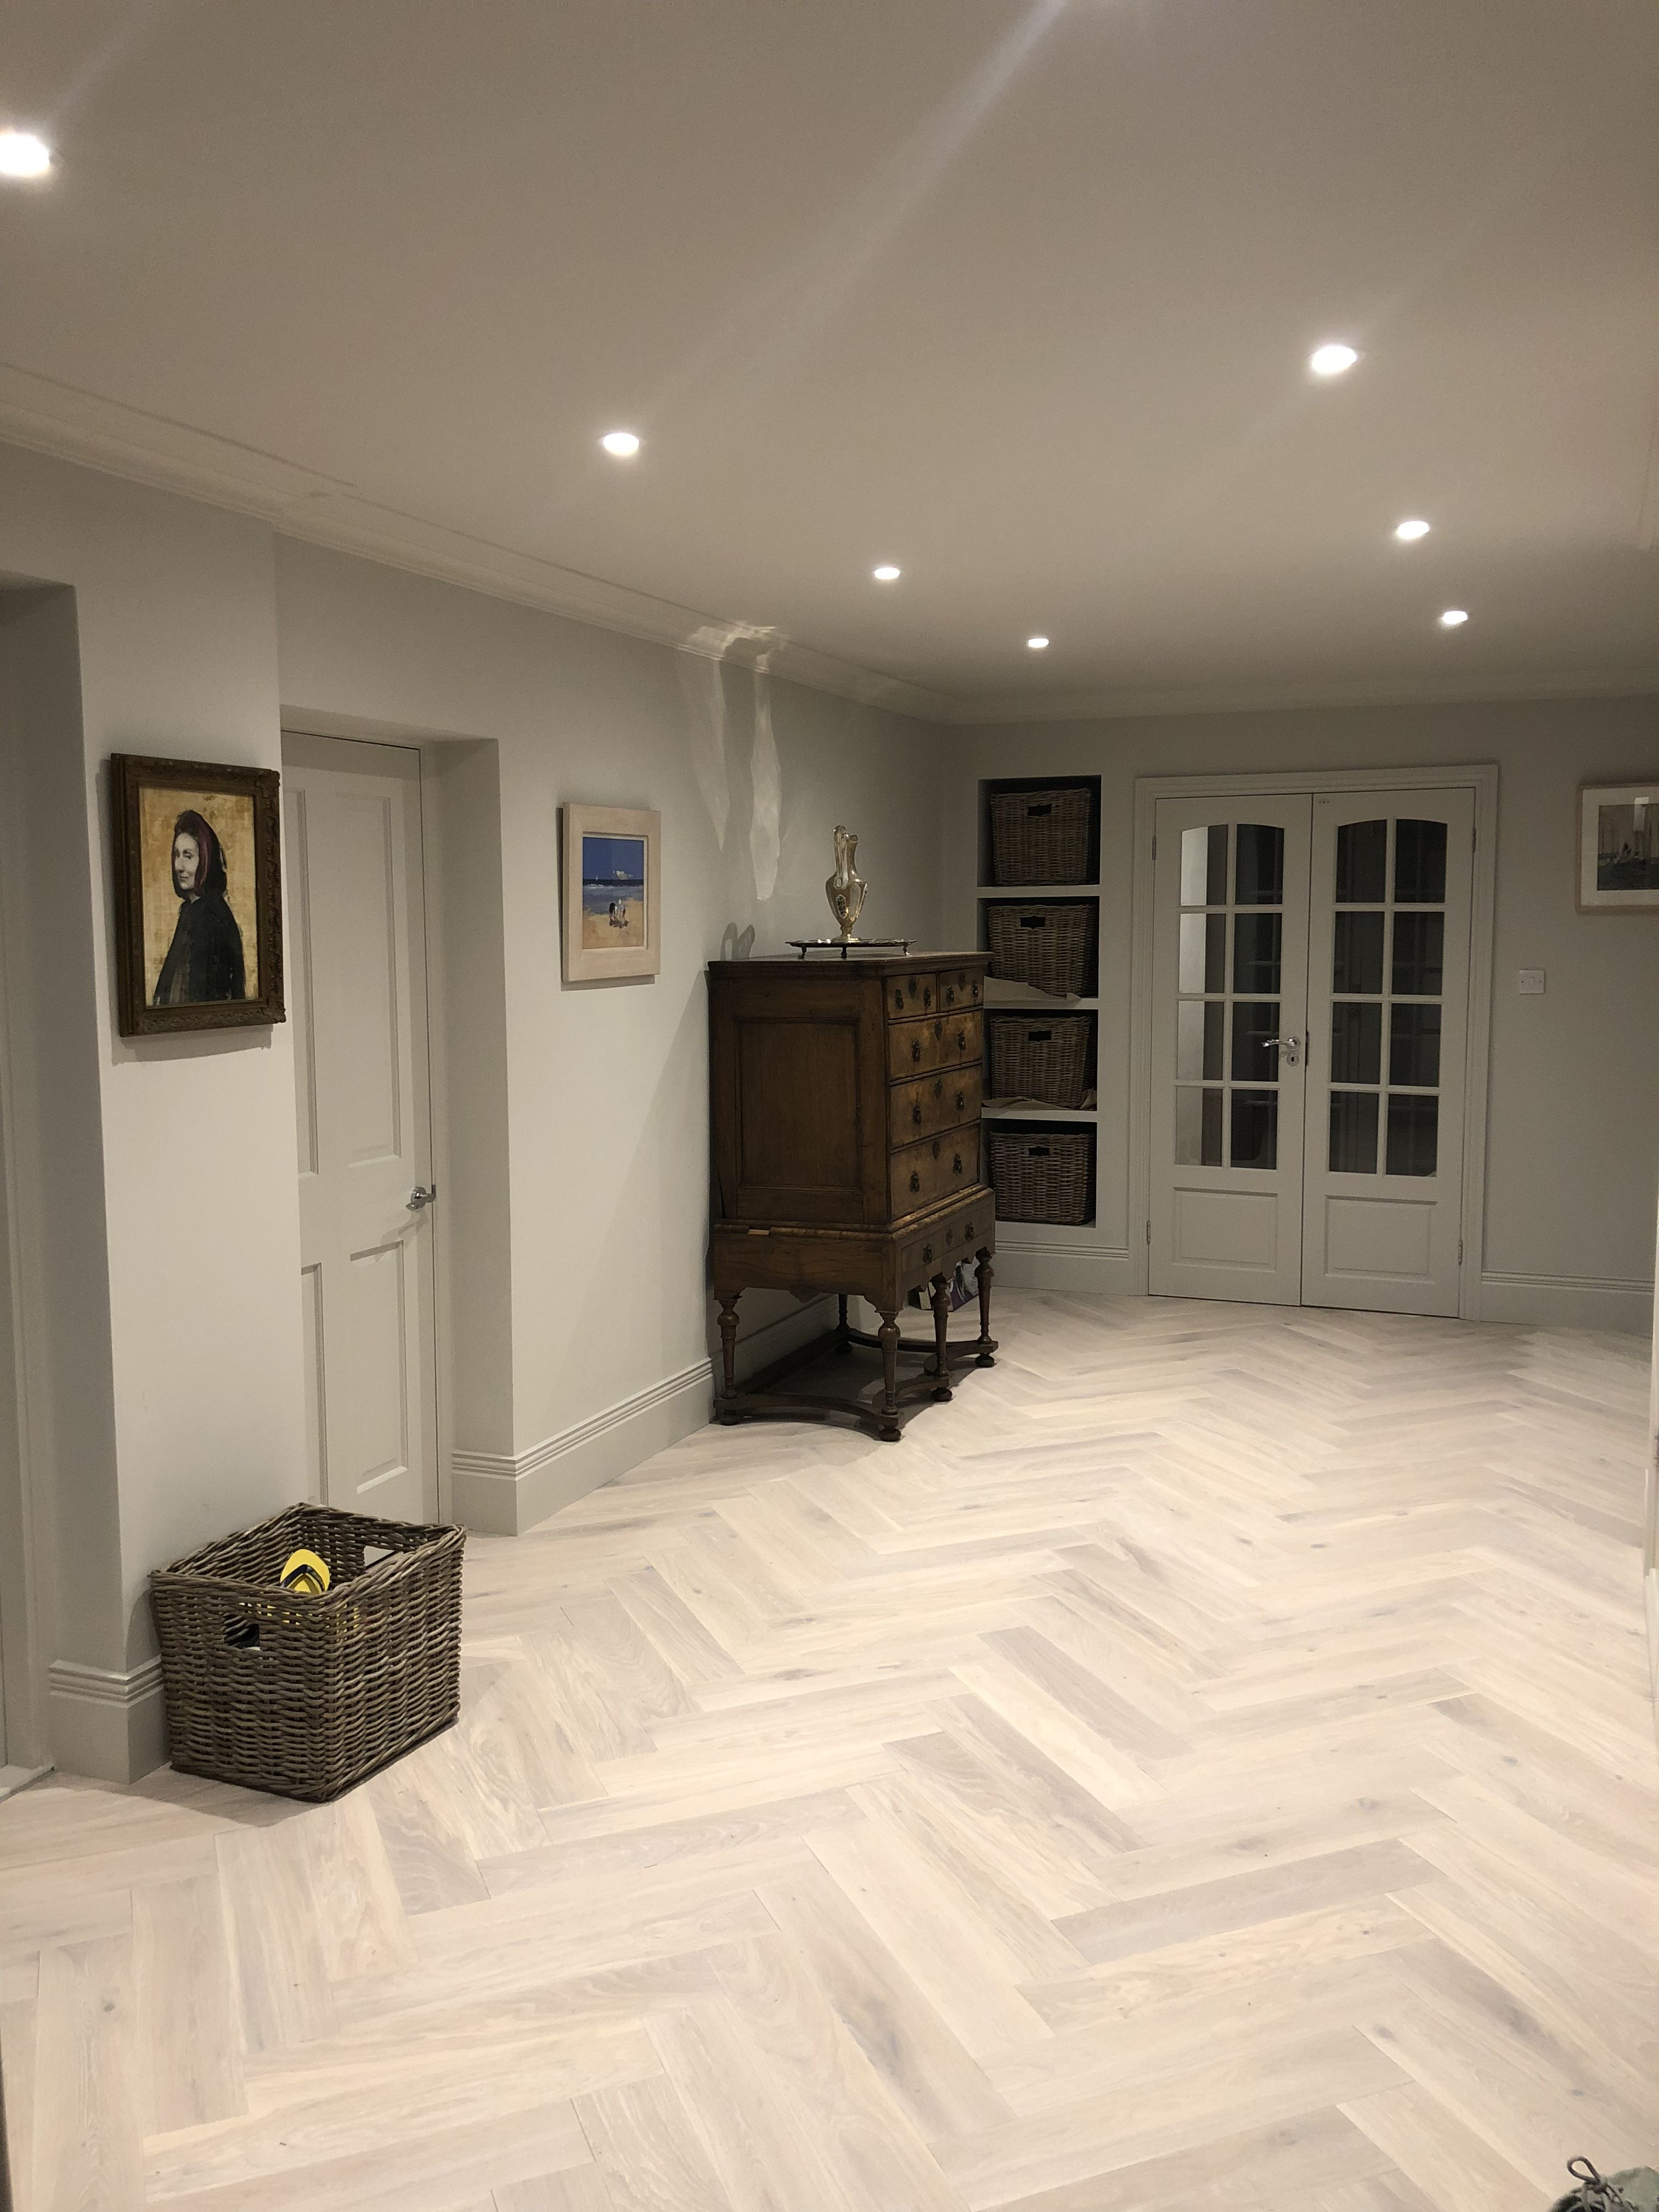 Really happy with my new wood herringbone hall floor